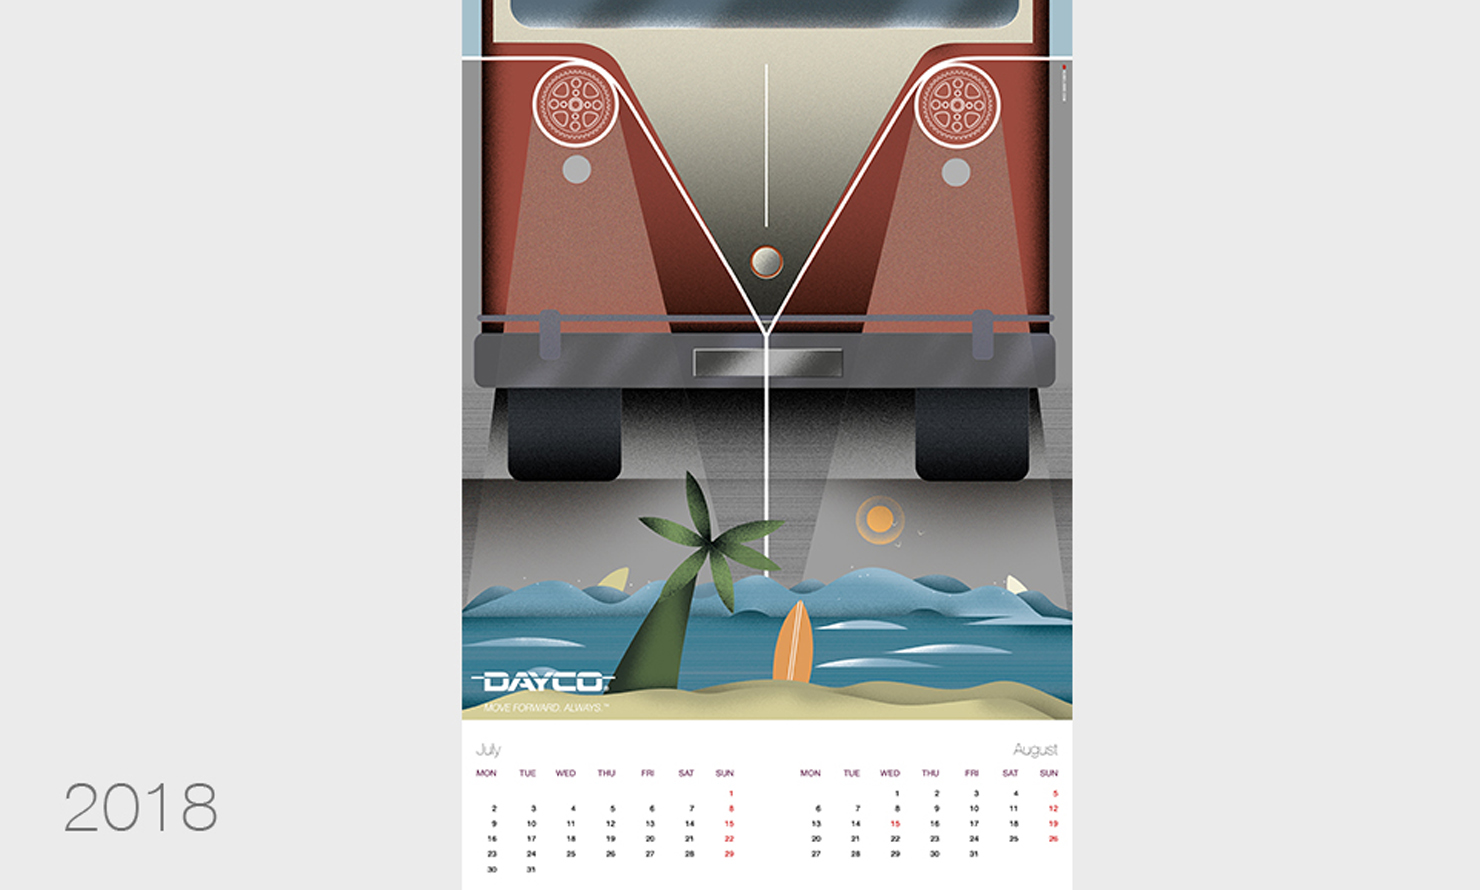 https://kubelibre.com/uploads/Slider-work-tutti-clienti/dayco-calendario-2018-4.jpg